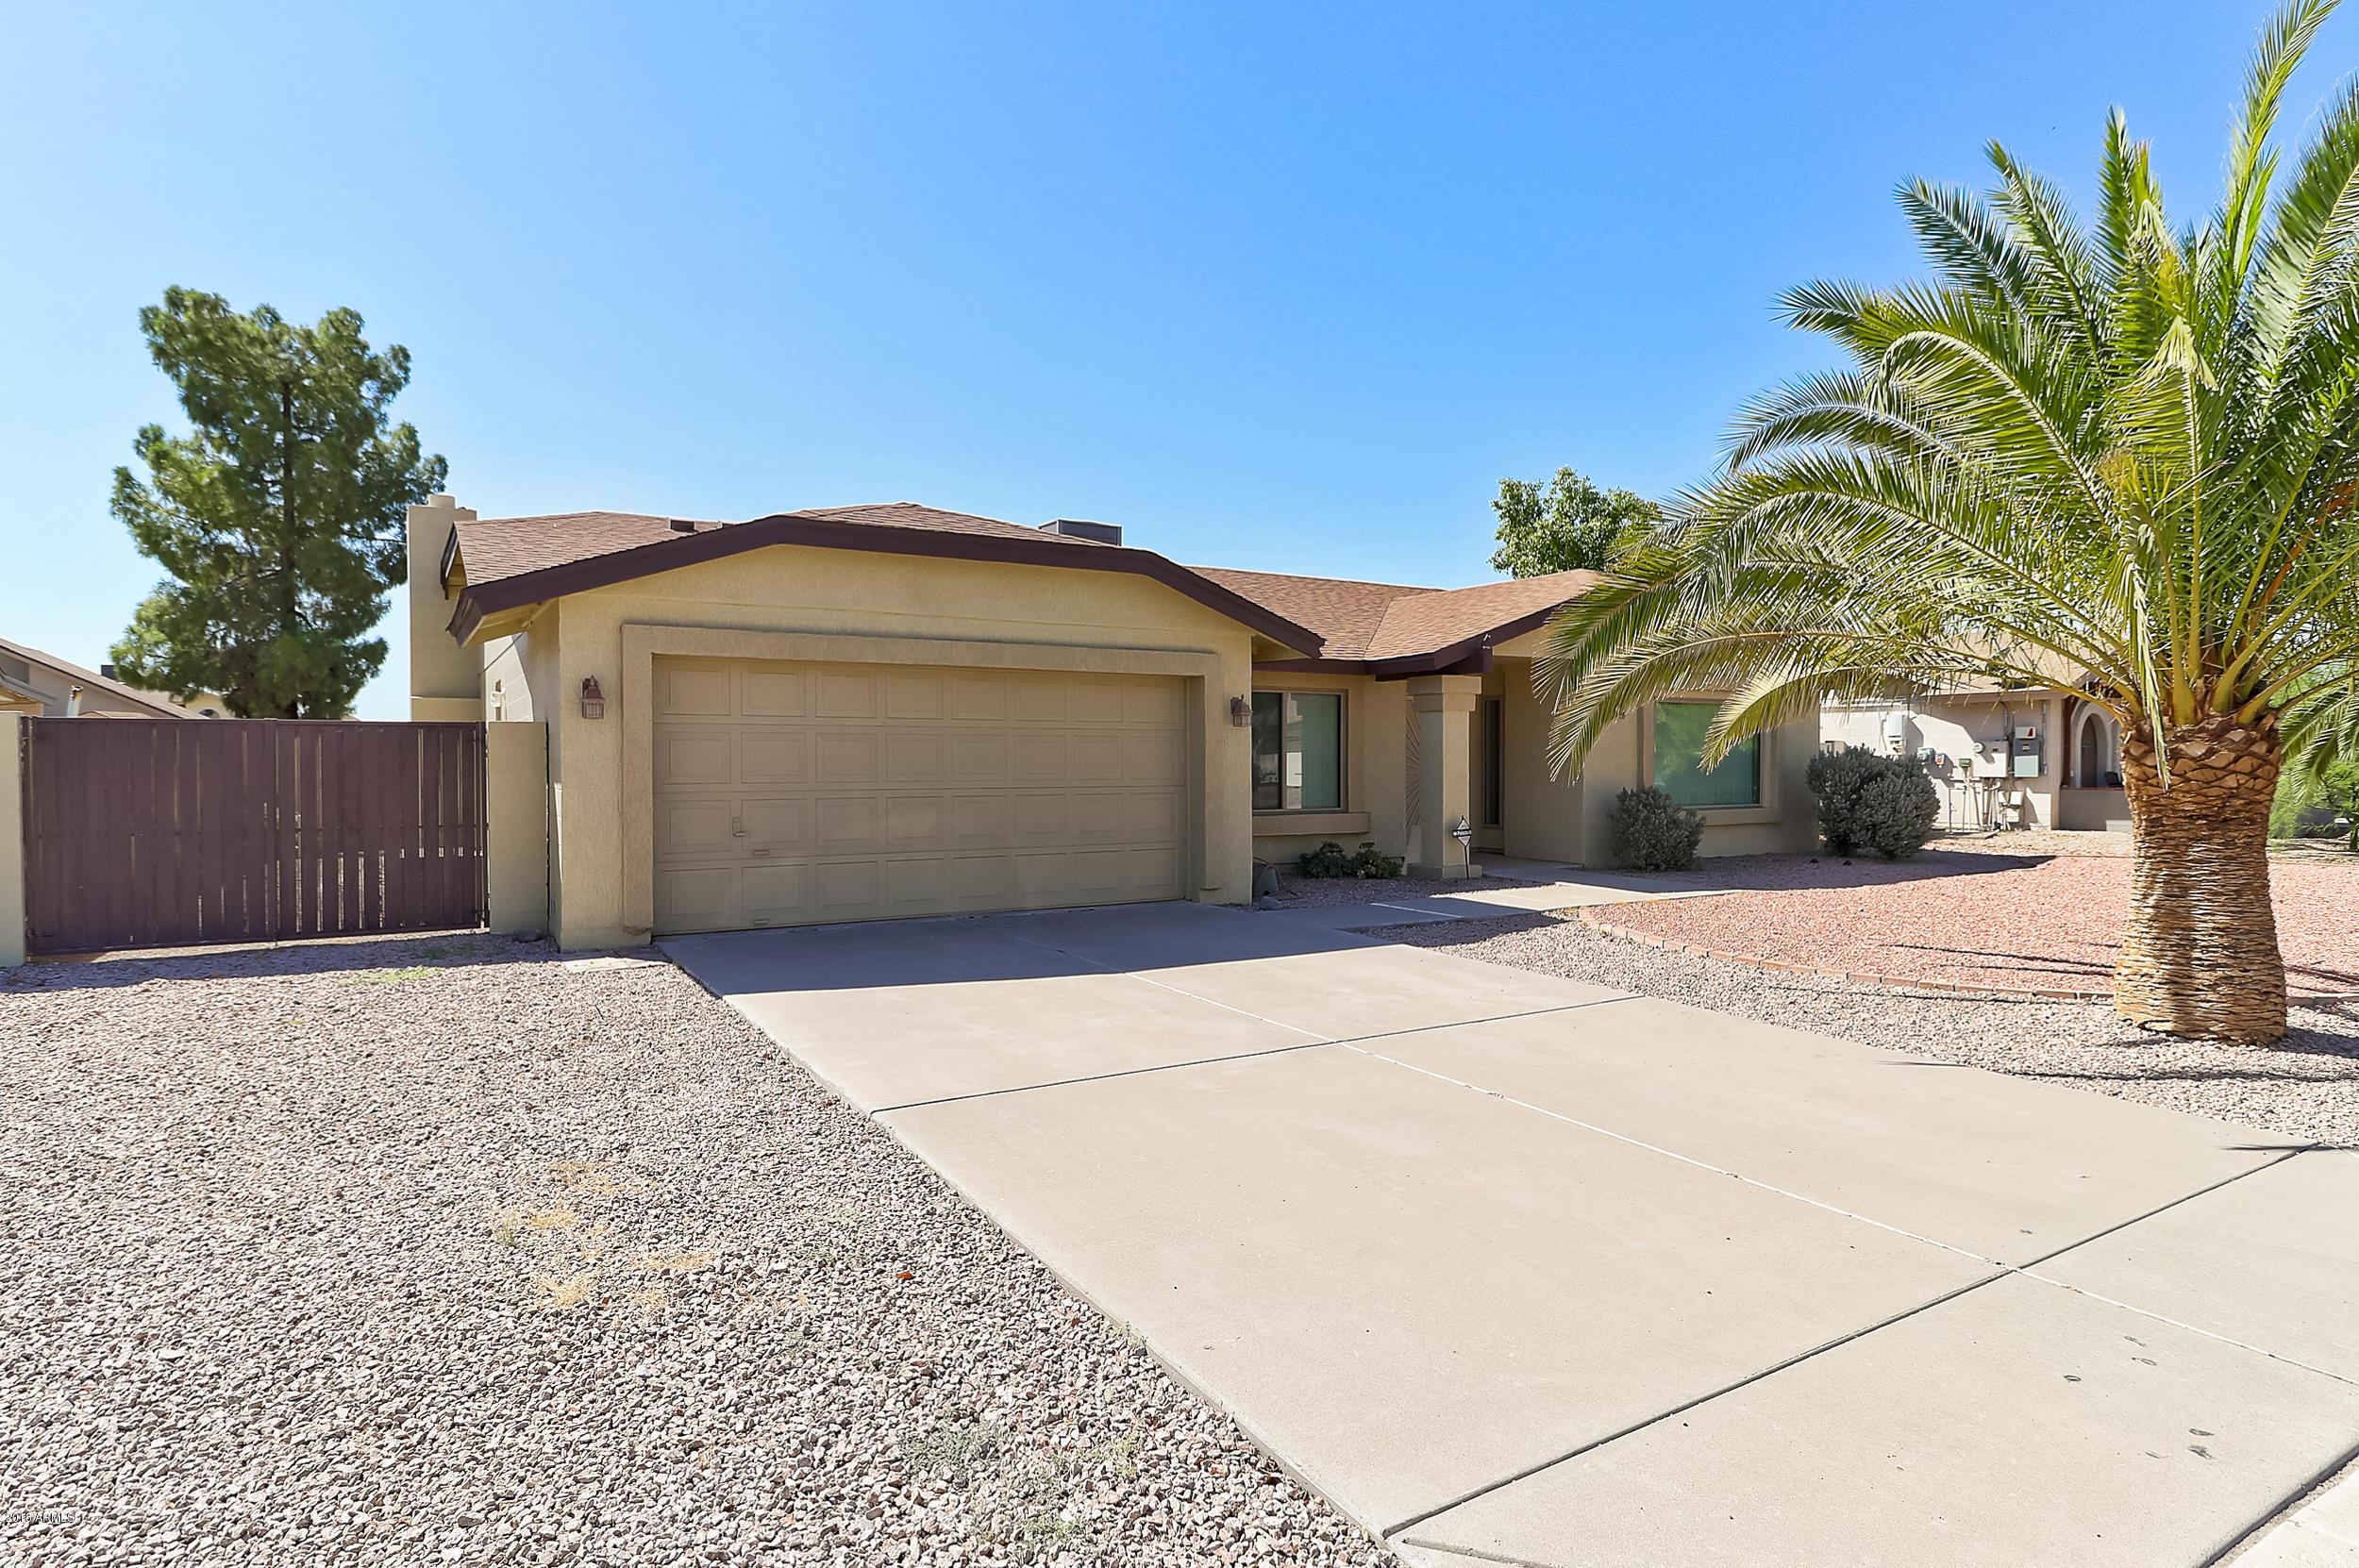 Photo of 7333 W CANTERBURY Drive, Peoria, AZ 85345